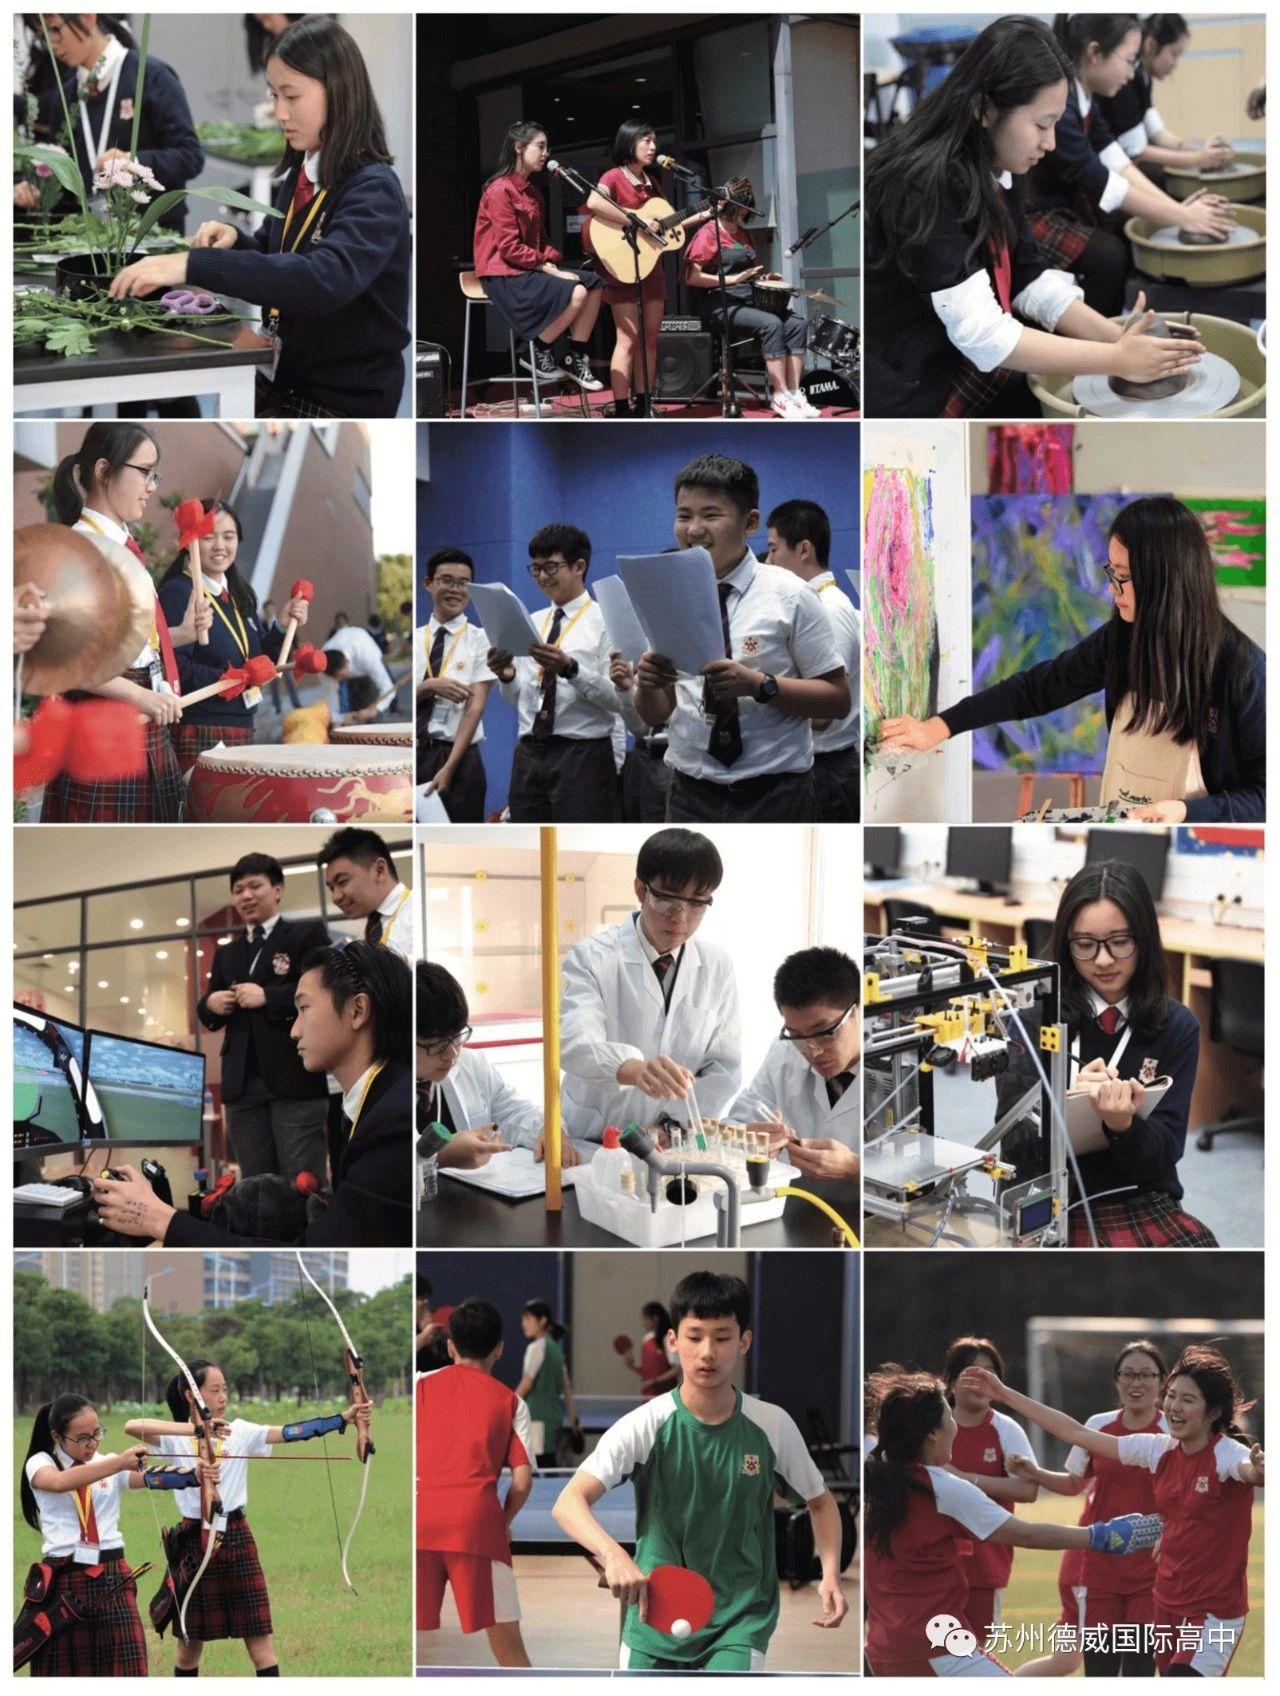 wechat-image-20190506093250-Dulwich_International_High_School_Suzhou